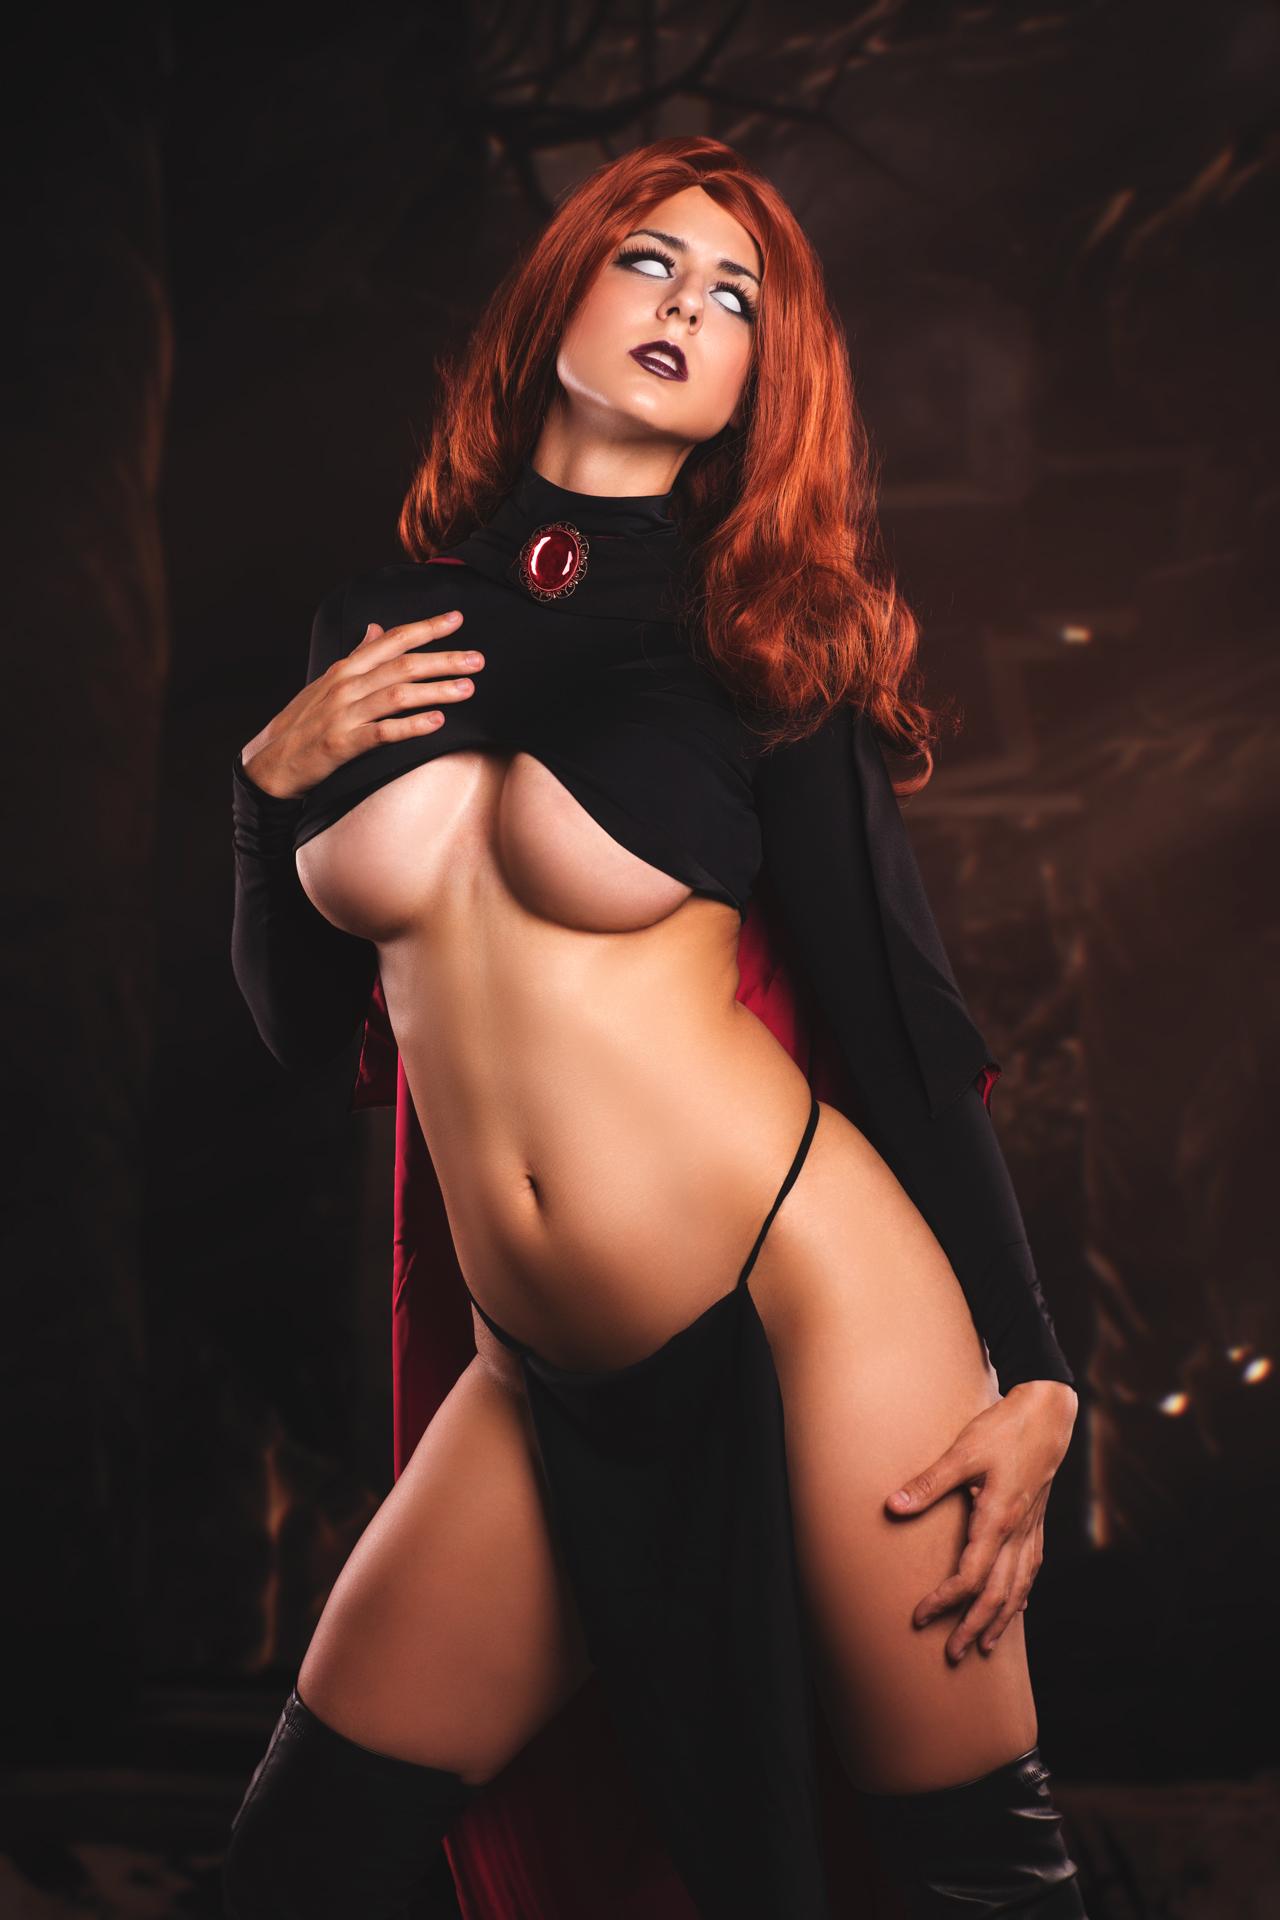 Goblin Queen Madelyne Pryor By Juby Headshot